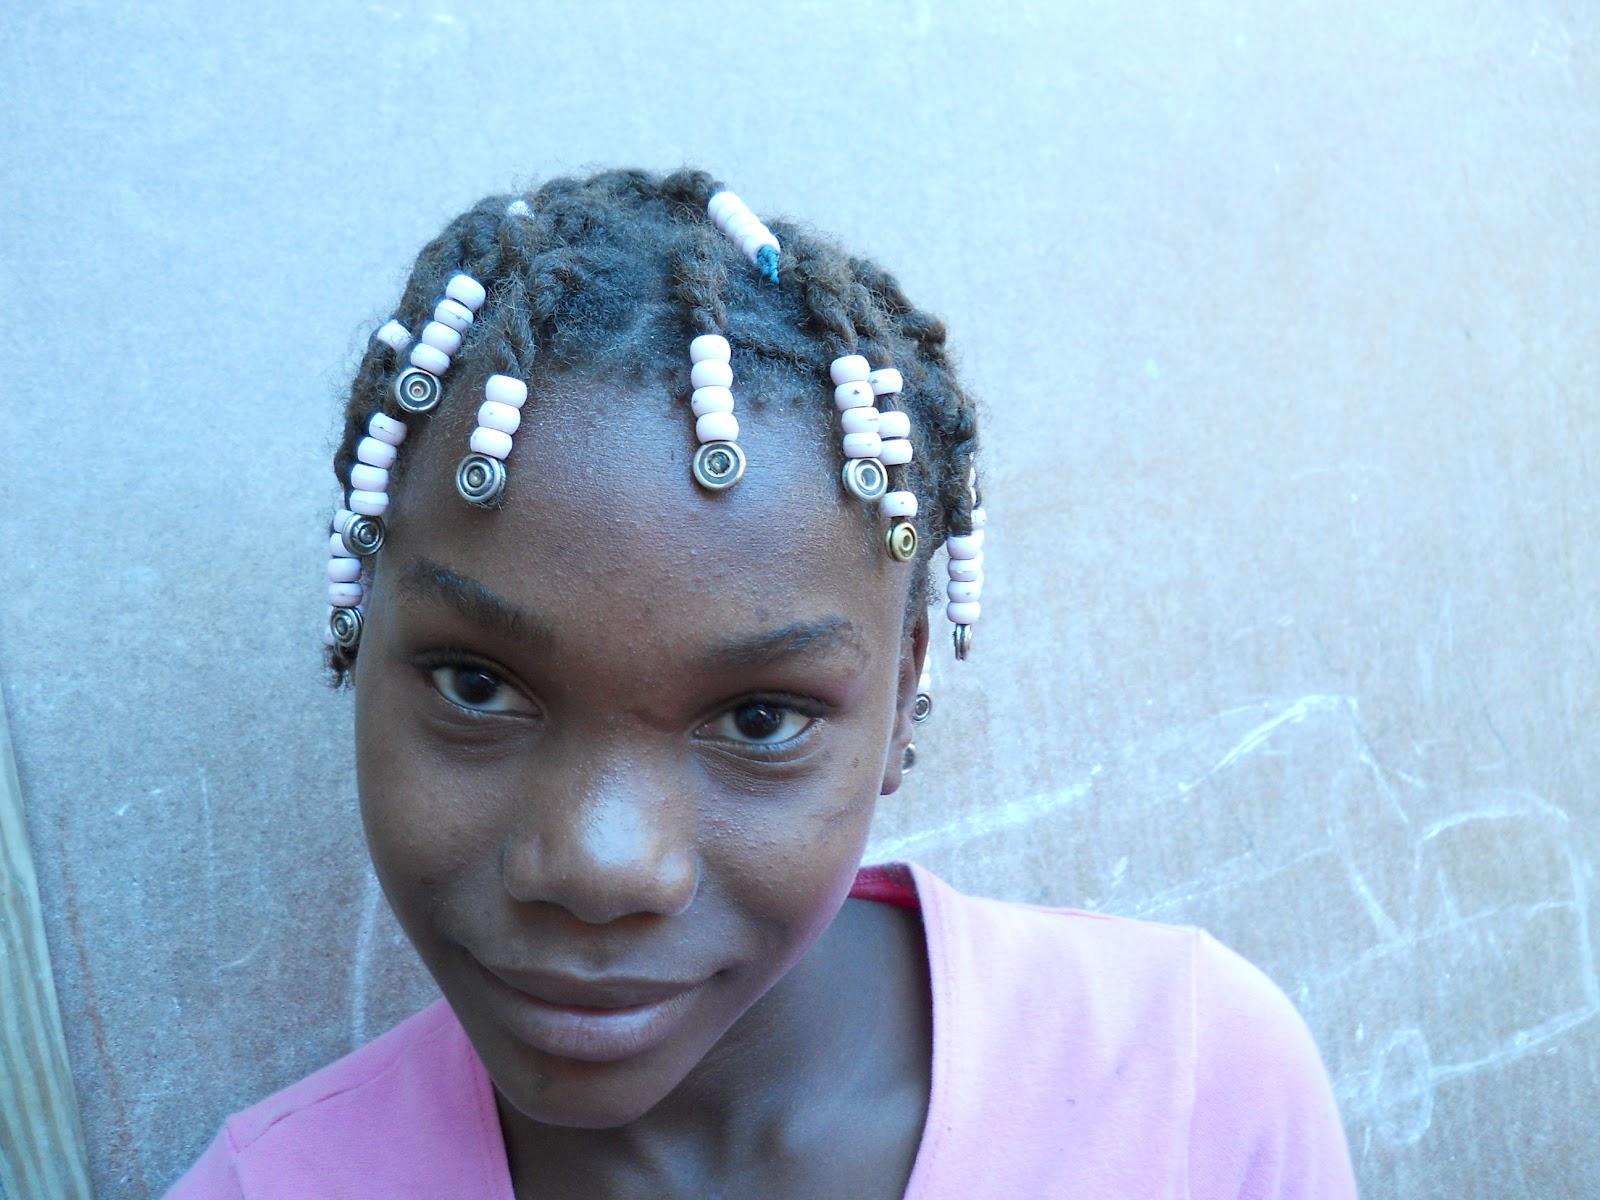 Hair Styles For Toddlers: Haiti Journey: Updates On Haiti